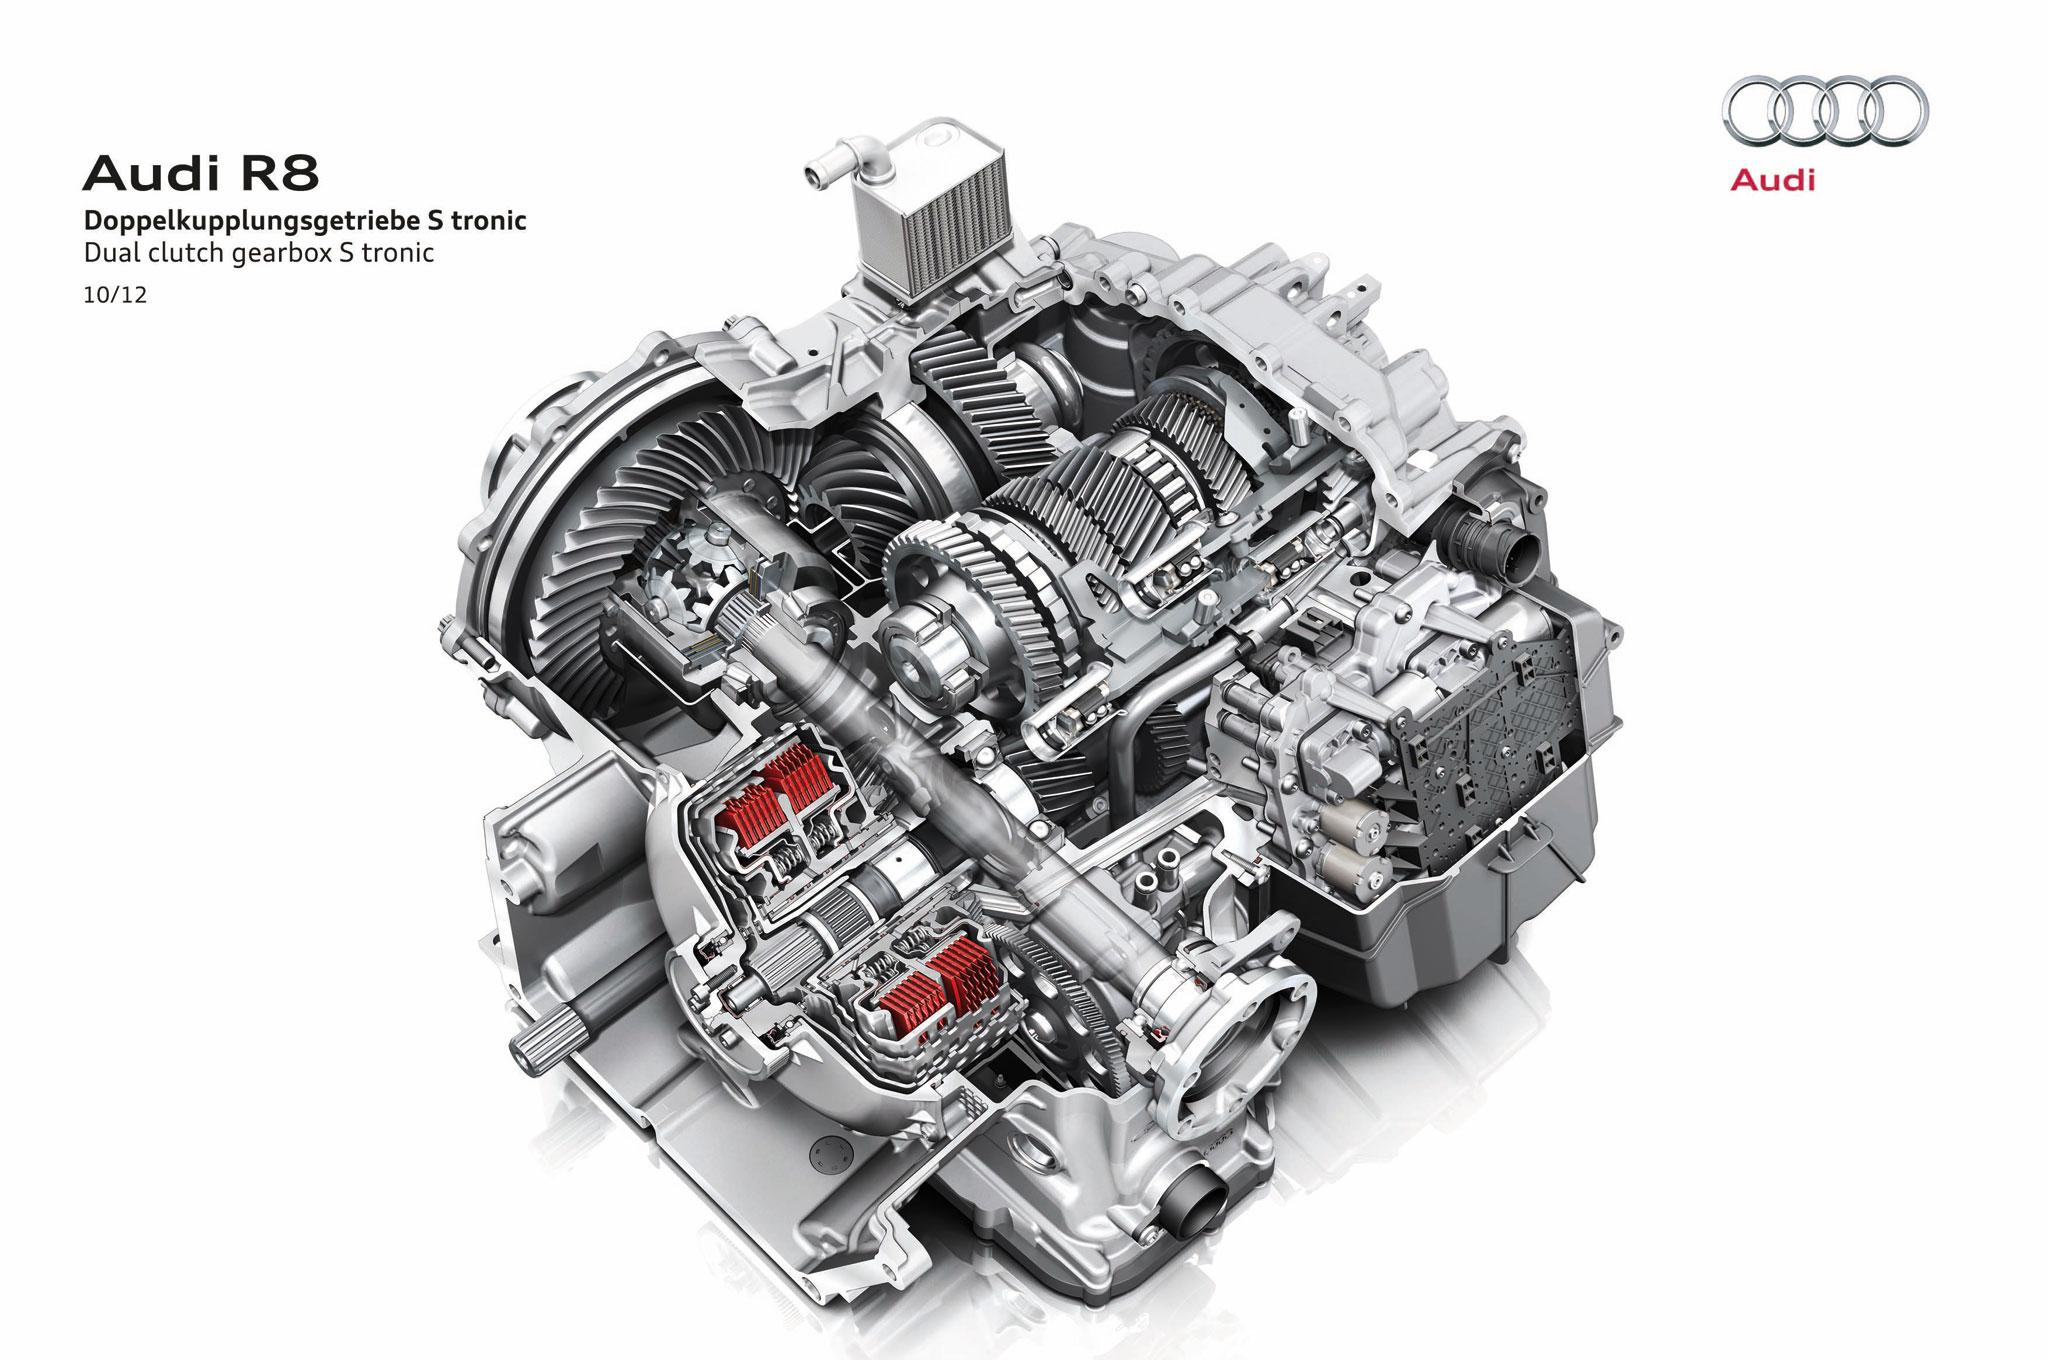 Audi R8 Engine Diagram - wiring diagram diode-total -  diode-total.hoteloctavia.it | Audi R8 Spyder Engine Diagram |  | hoteloctavia.it